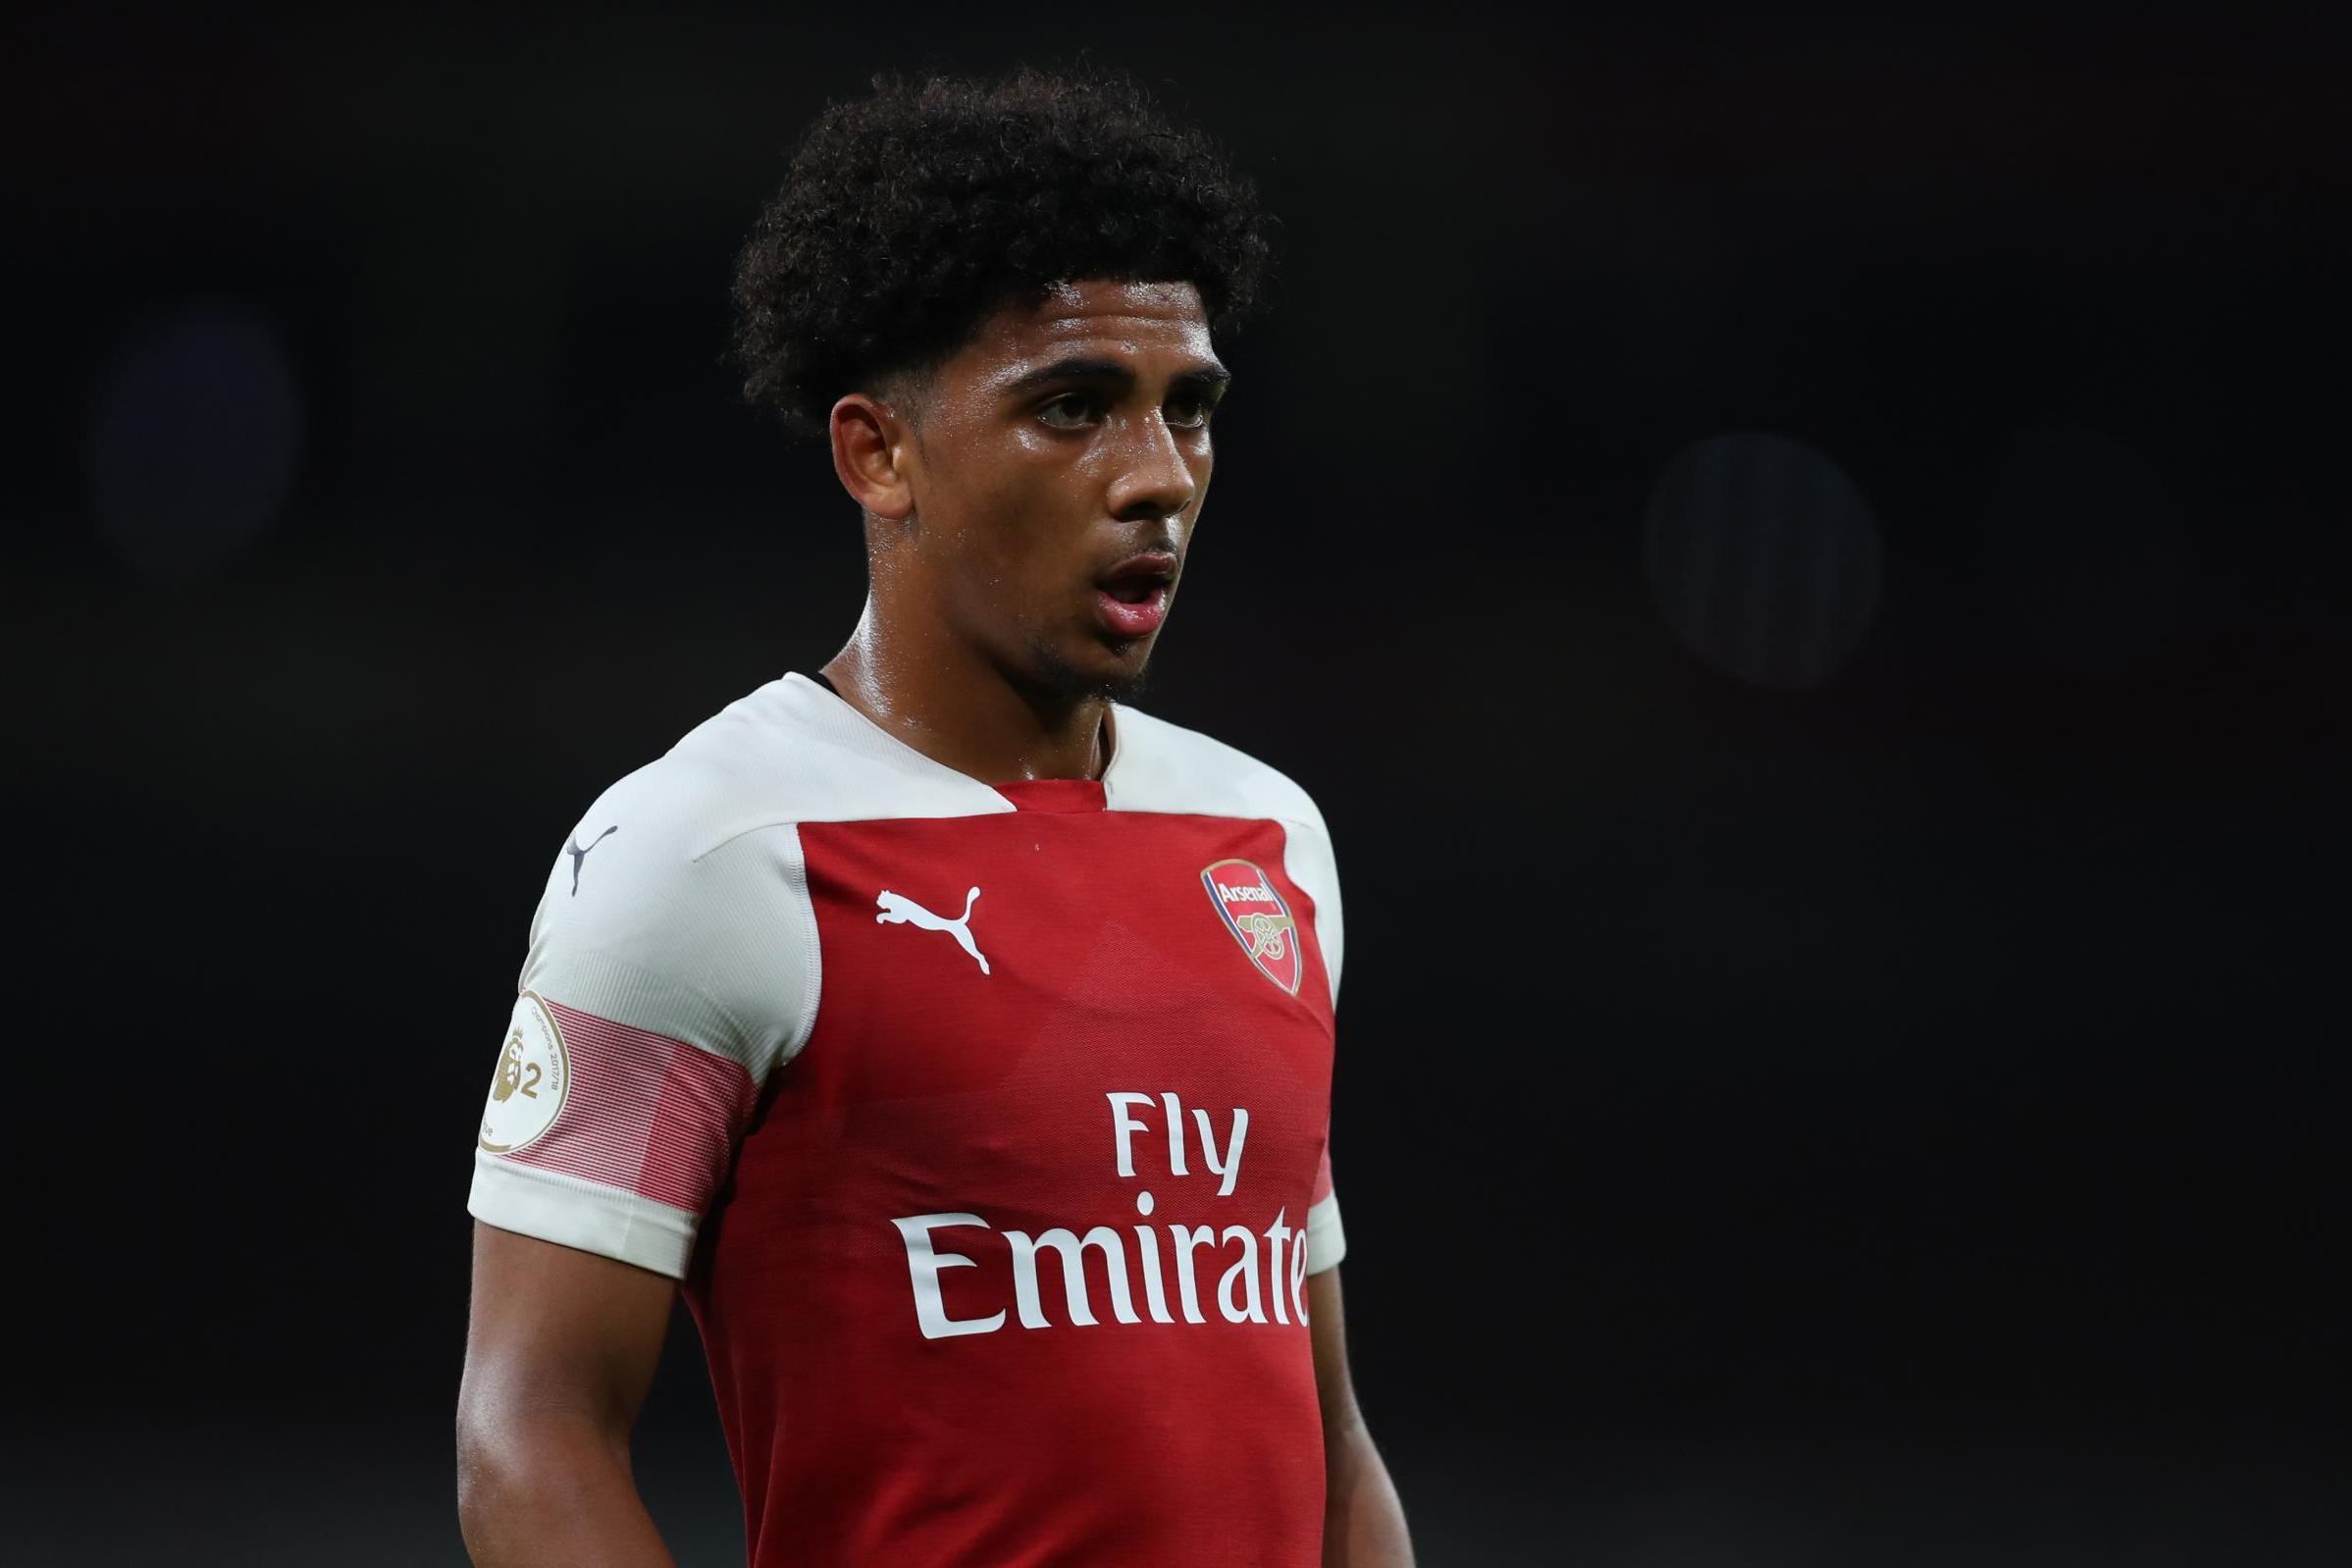 Pemain Muda Arsenal Masuk Radar Munich